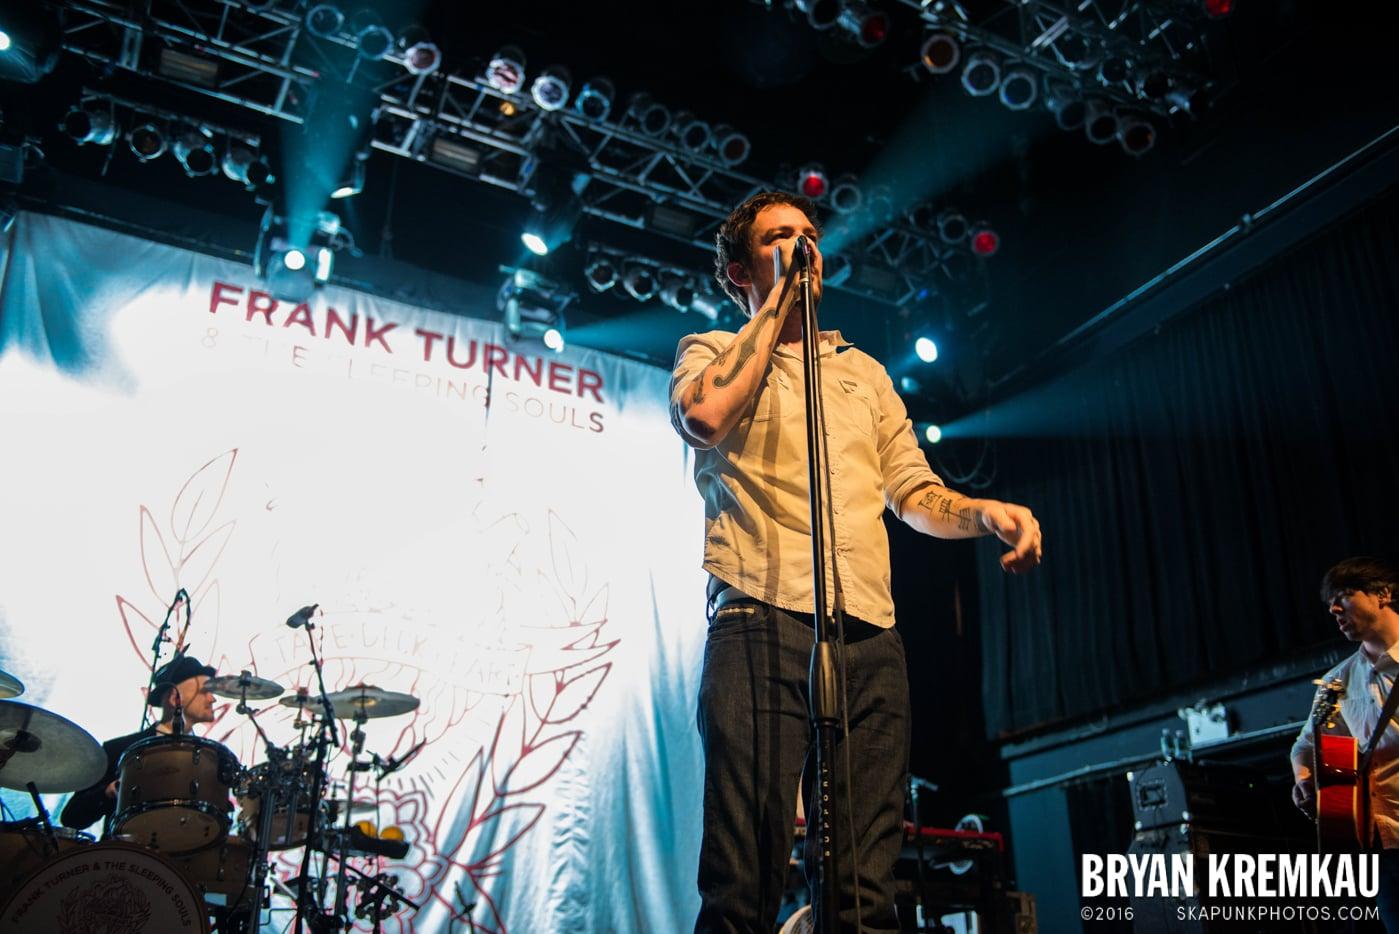 Frank Turner & The Sleeping Souls @ Terminal 5, NYC - 11.27.13 (33)